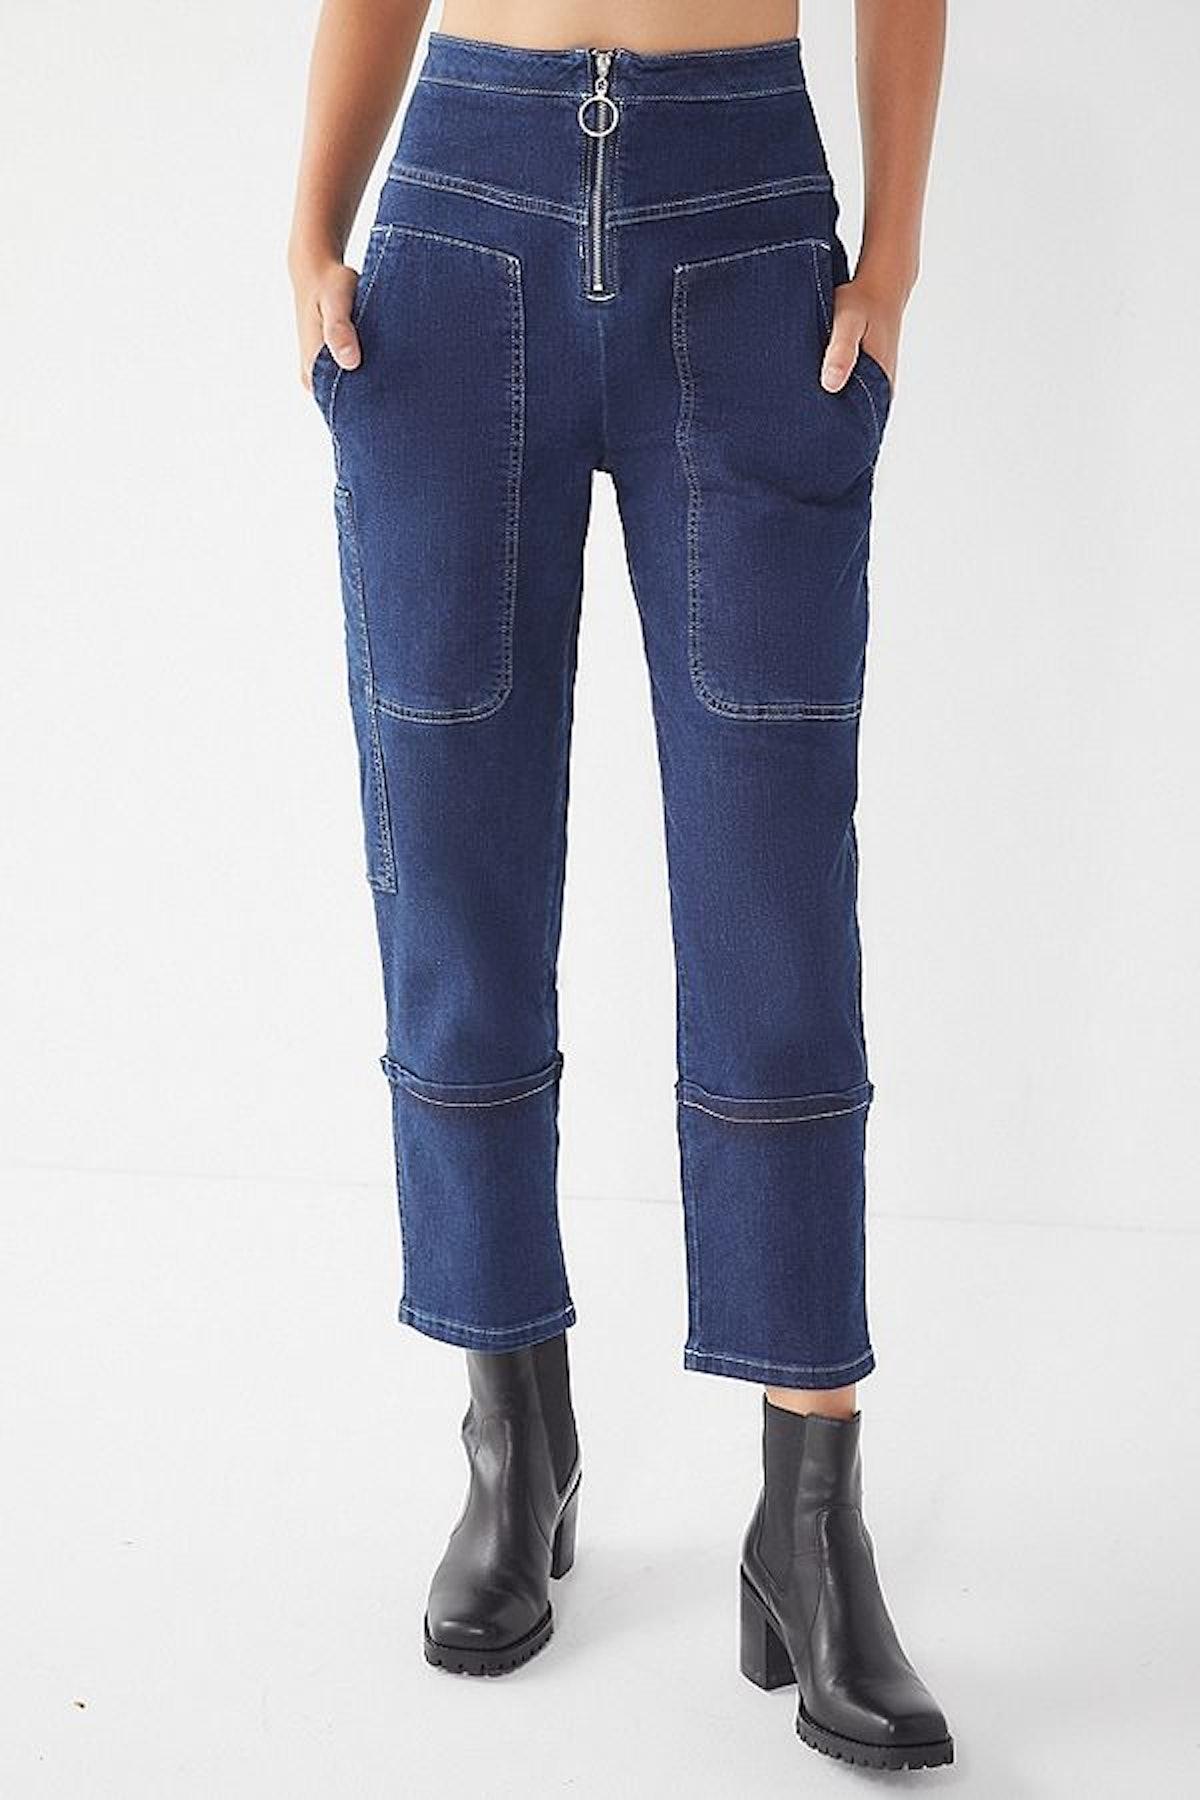 UO Max Contrast Stitch Straight-Leg Jean